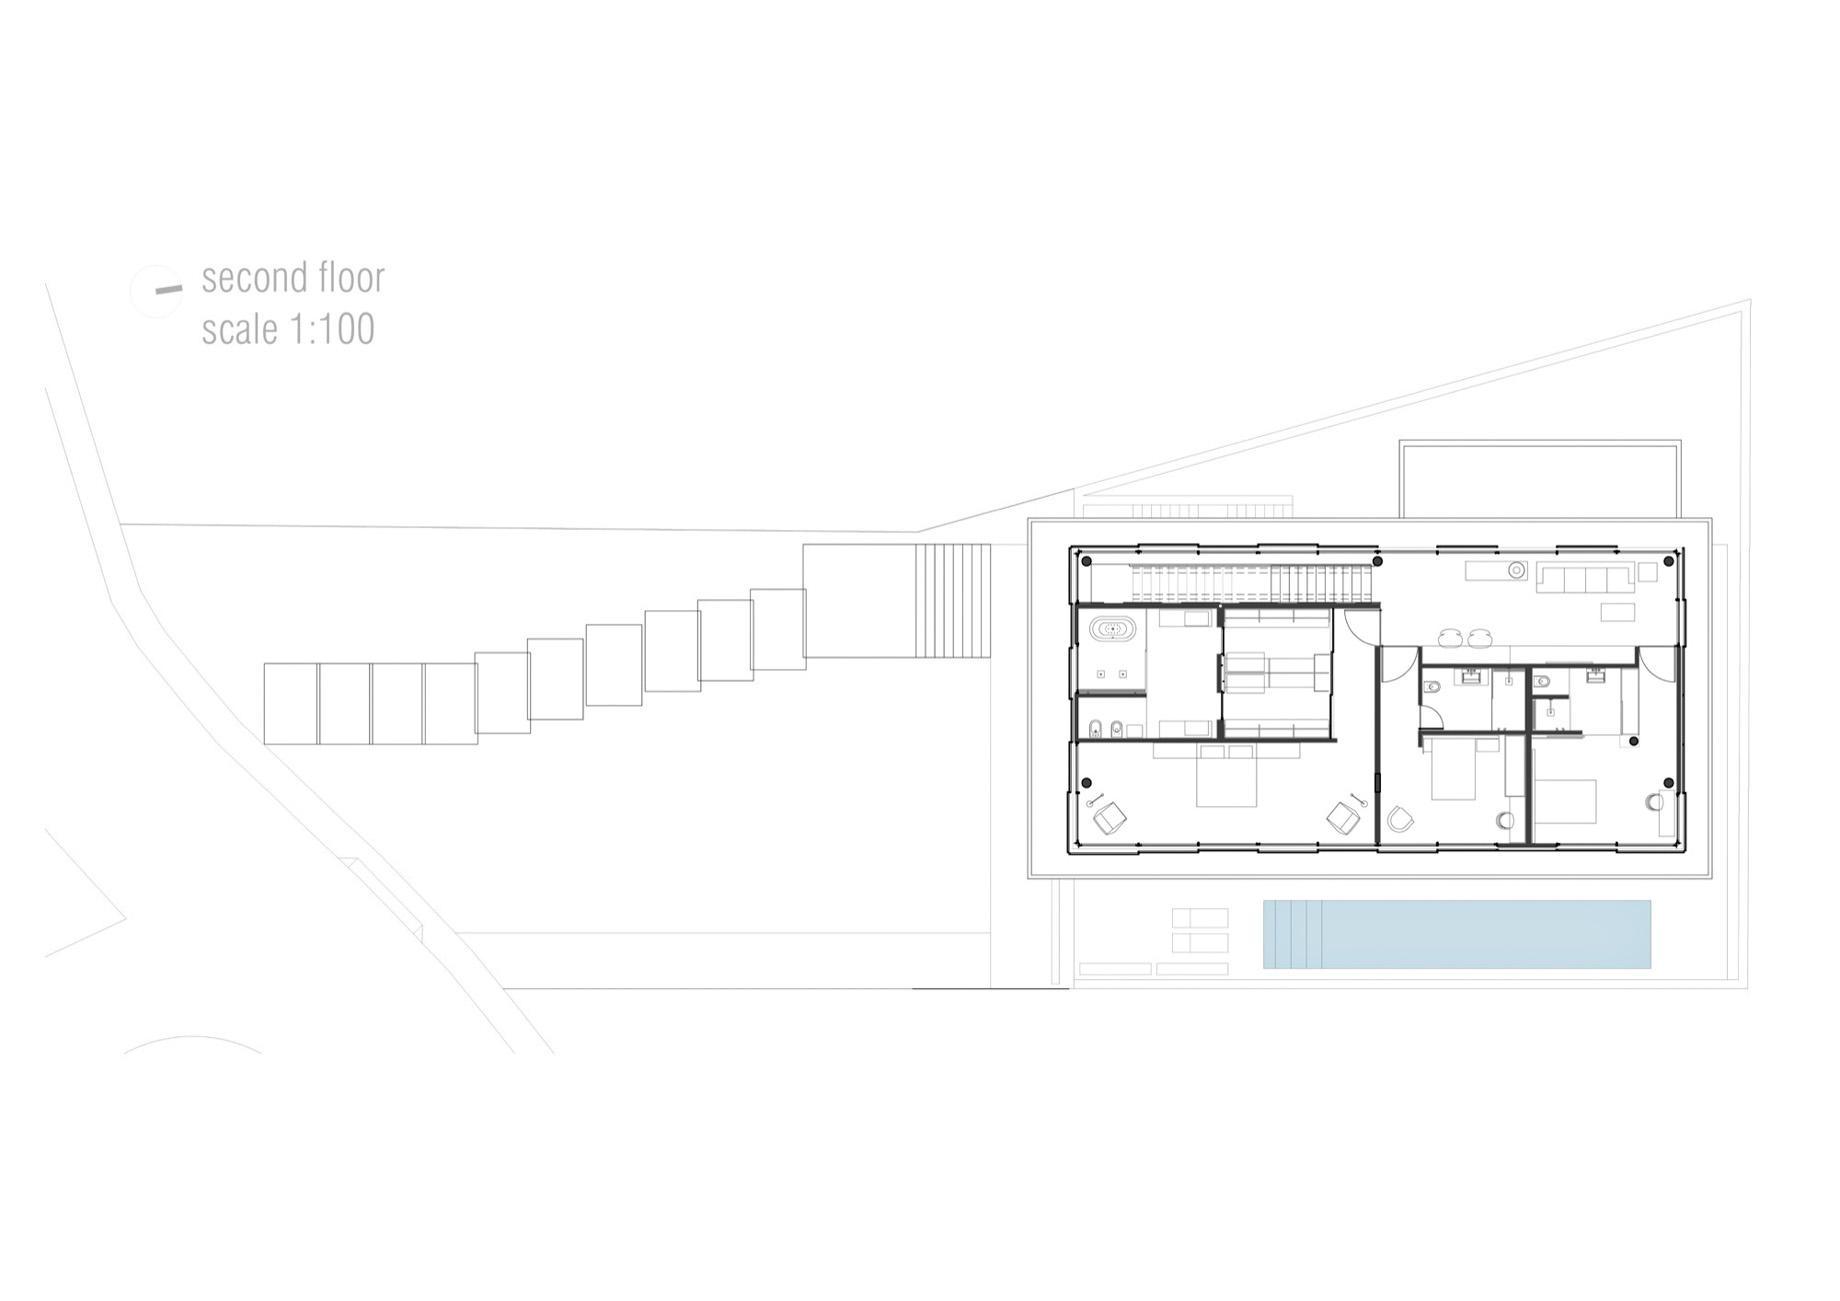 Floor Plan - Casa Bravos Luxury Residence - Itajai, Santa Catarina, Brazil